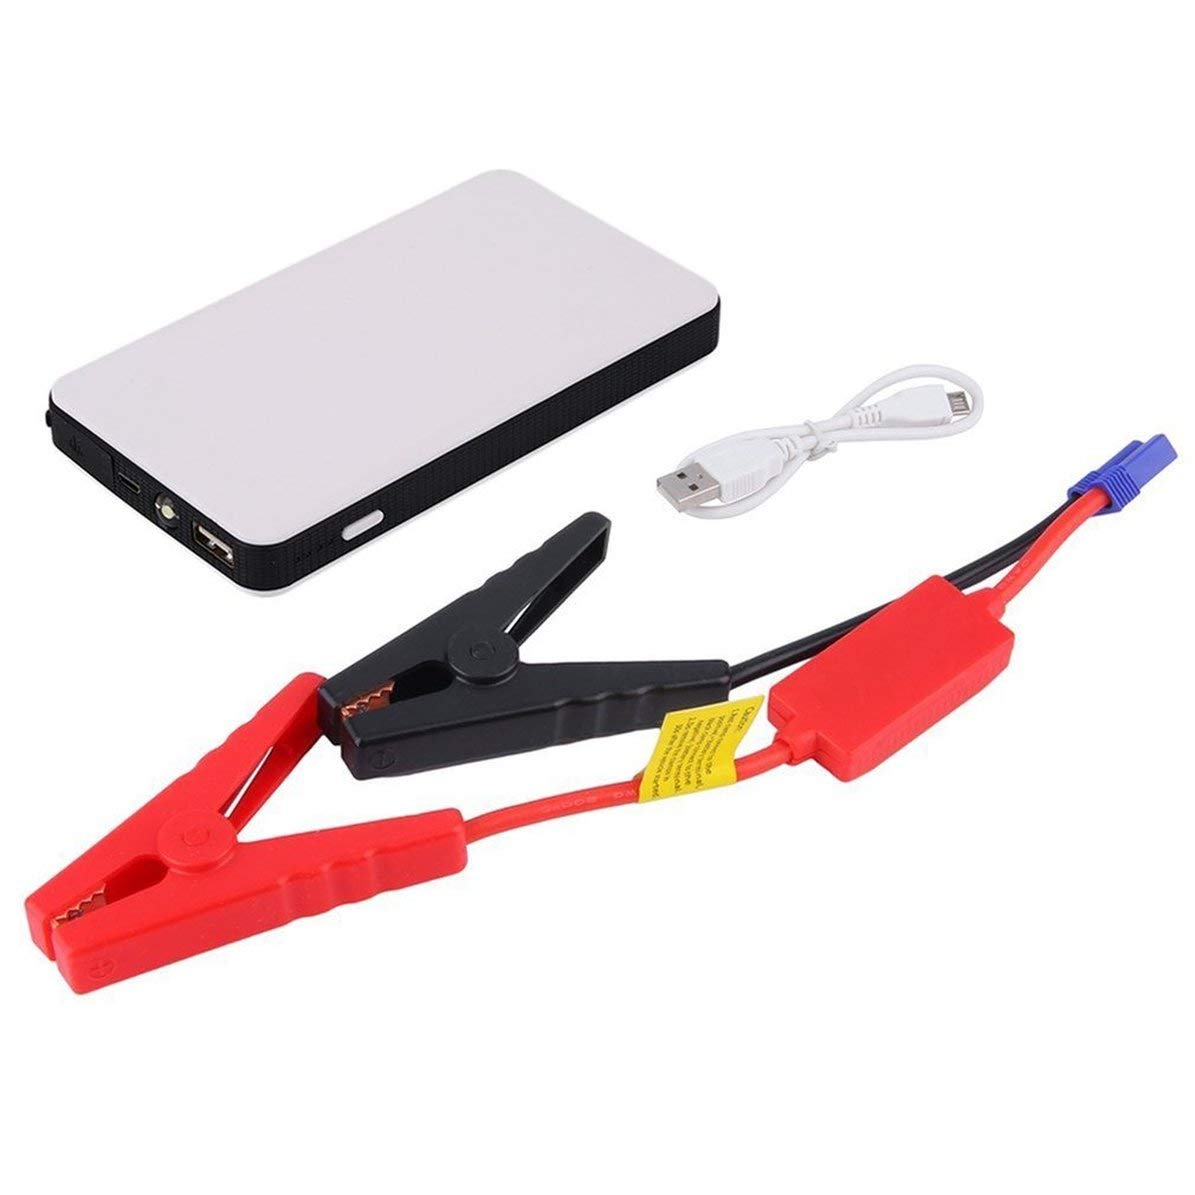 DoMoment Jump Starter Battery, 12V 20000mAh Mini Portable Multifunctional Car Jump Starter Power Booster Battery Charger Emergency Start Charger